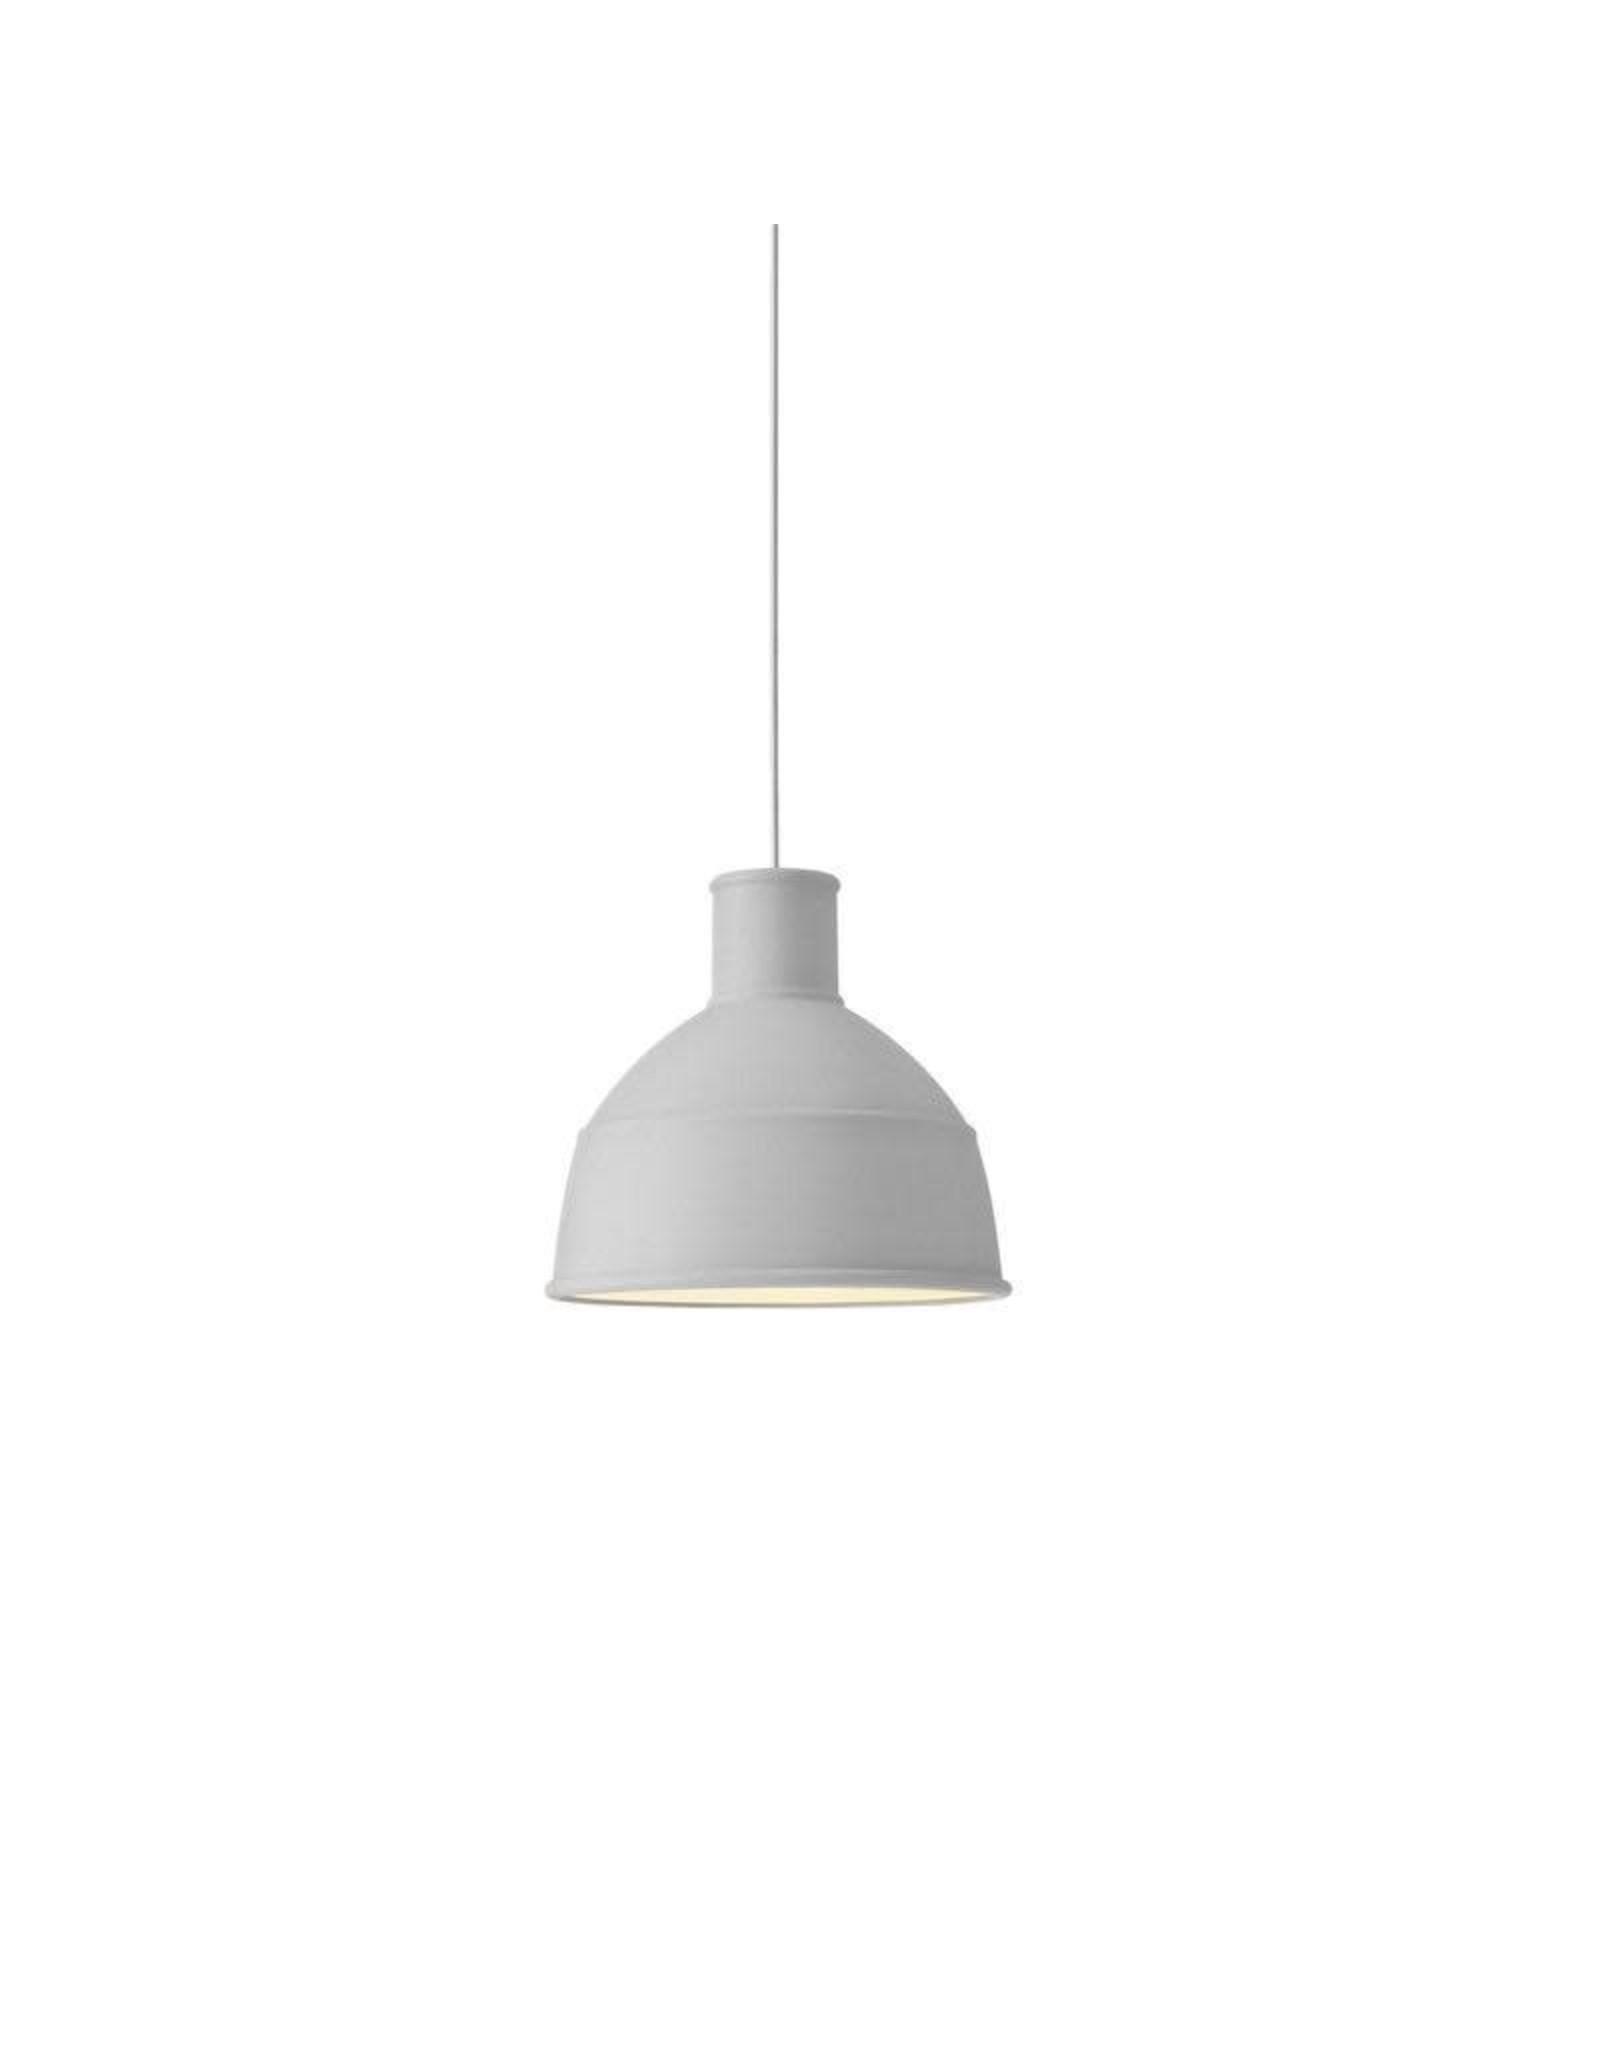 UNFOLD PENDANT LAMP